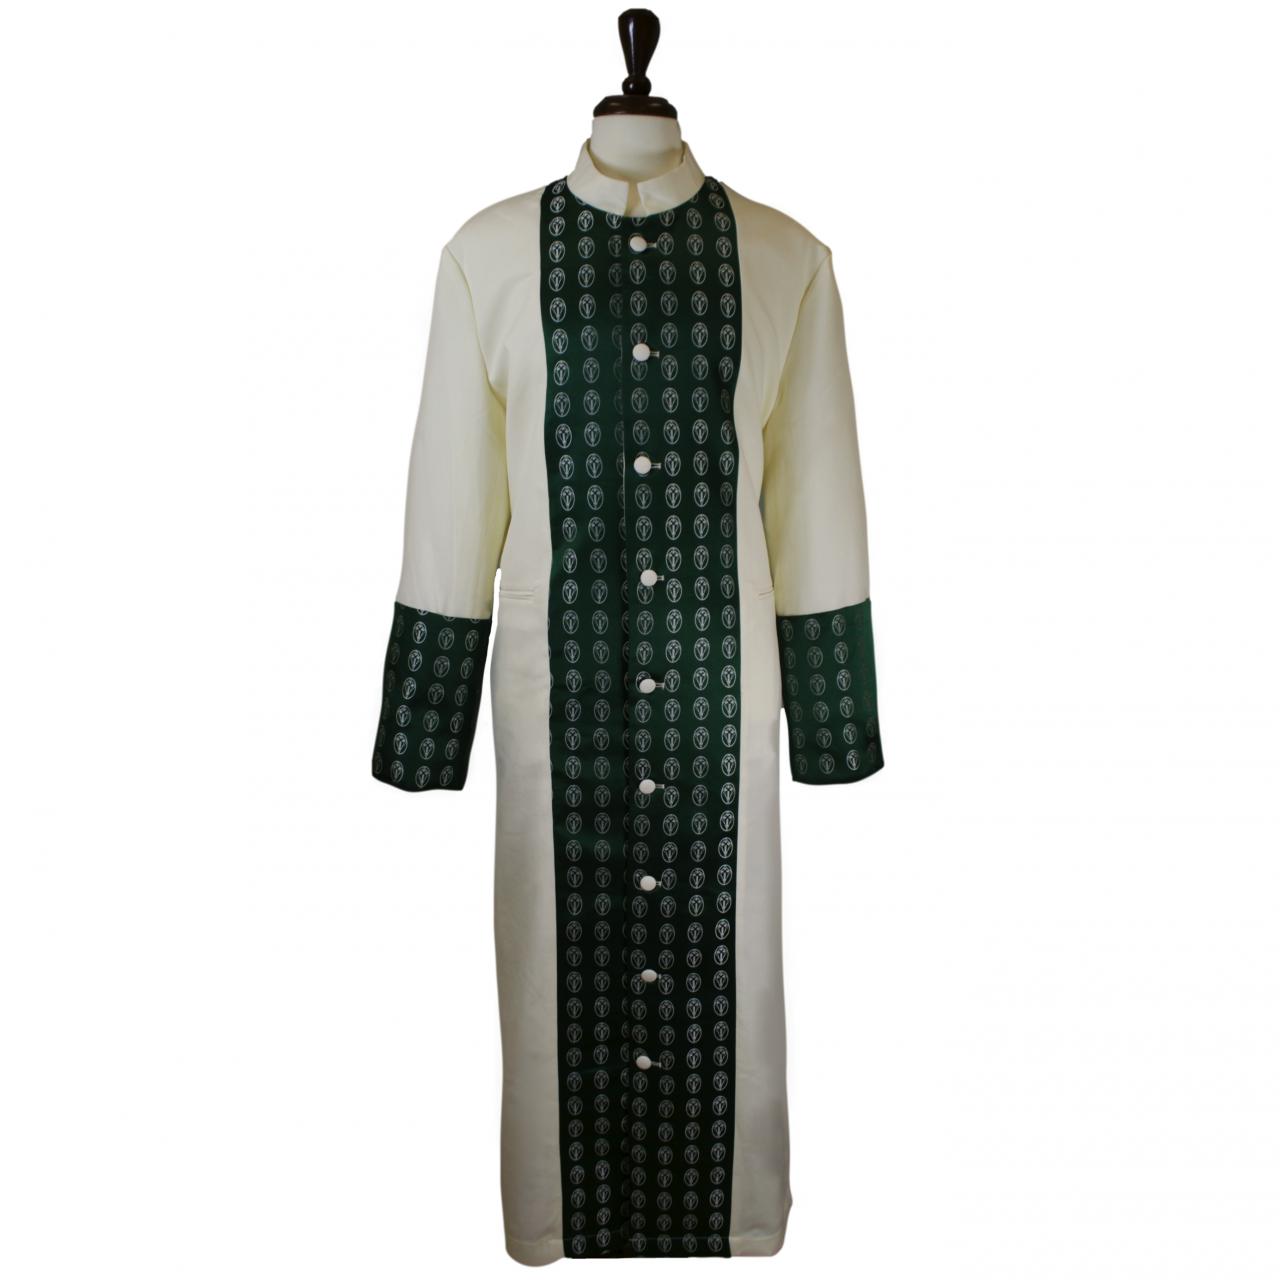 805 M. Men's Premium Pastor/Clergy Robe - Creme/Emerald Green Brocade